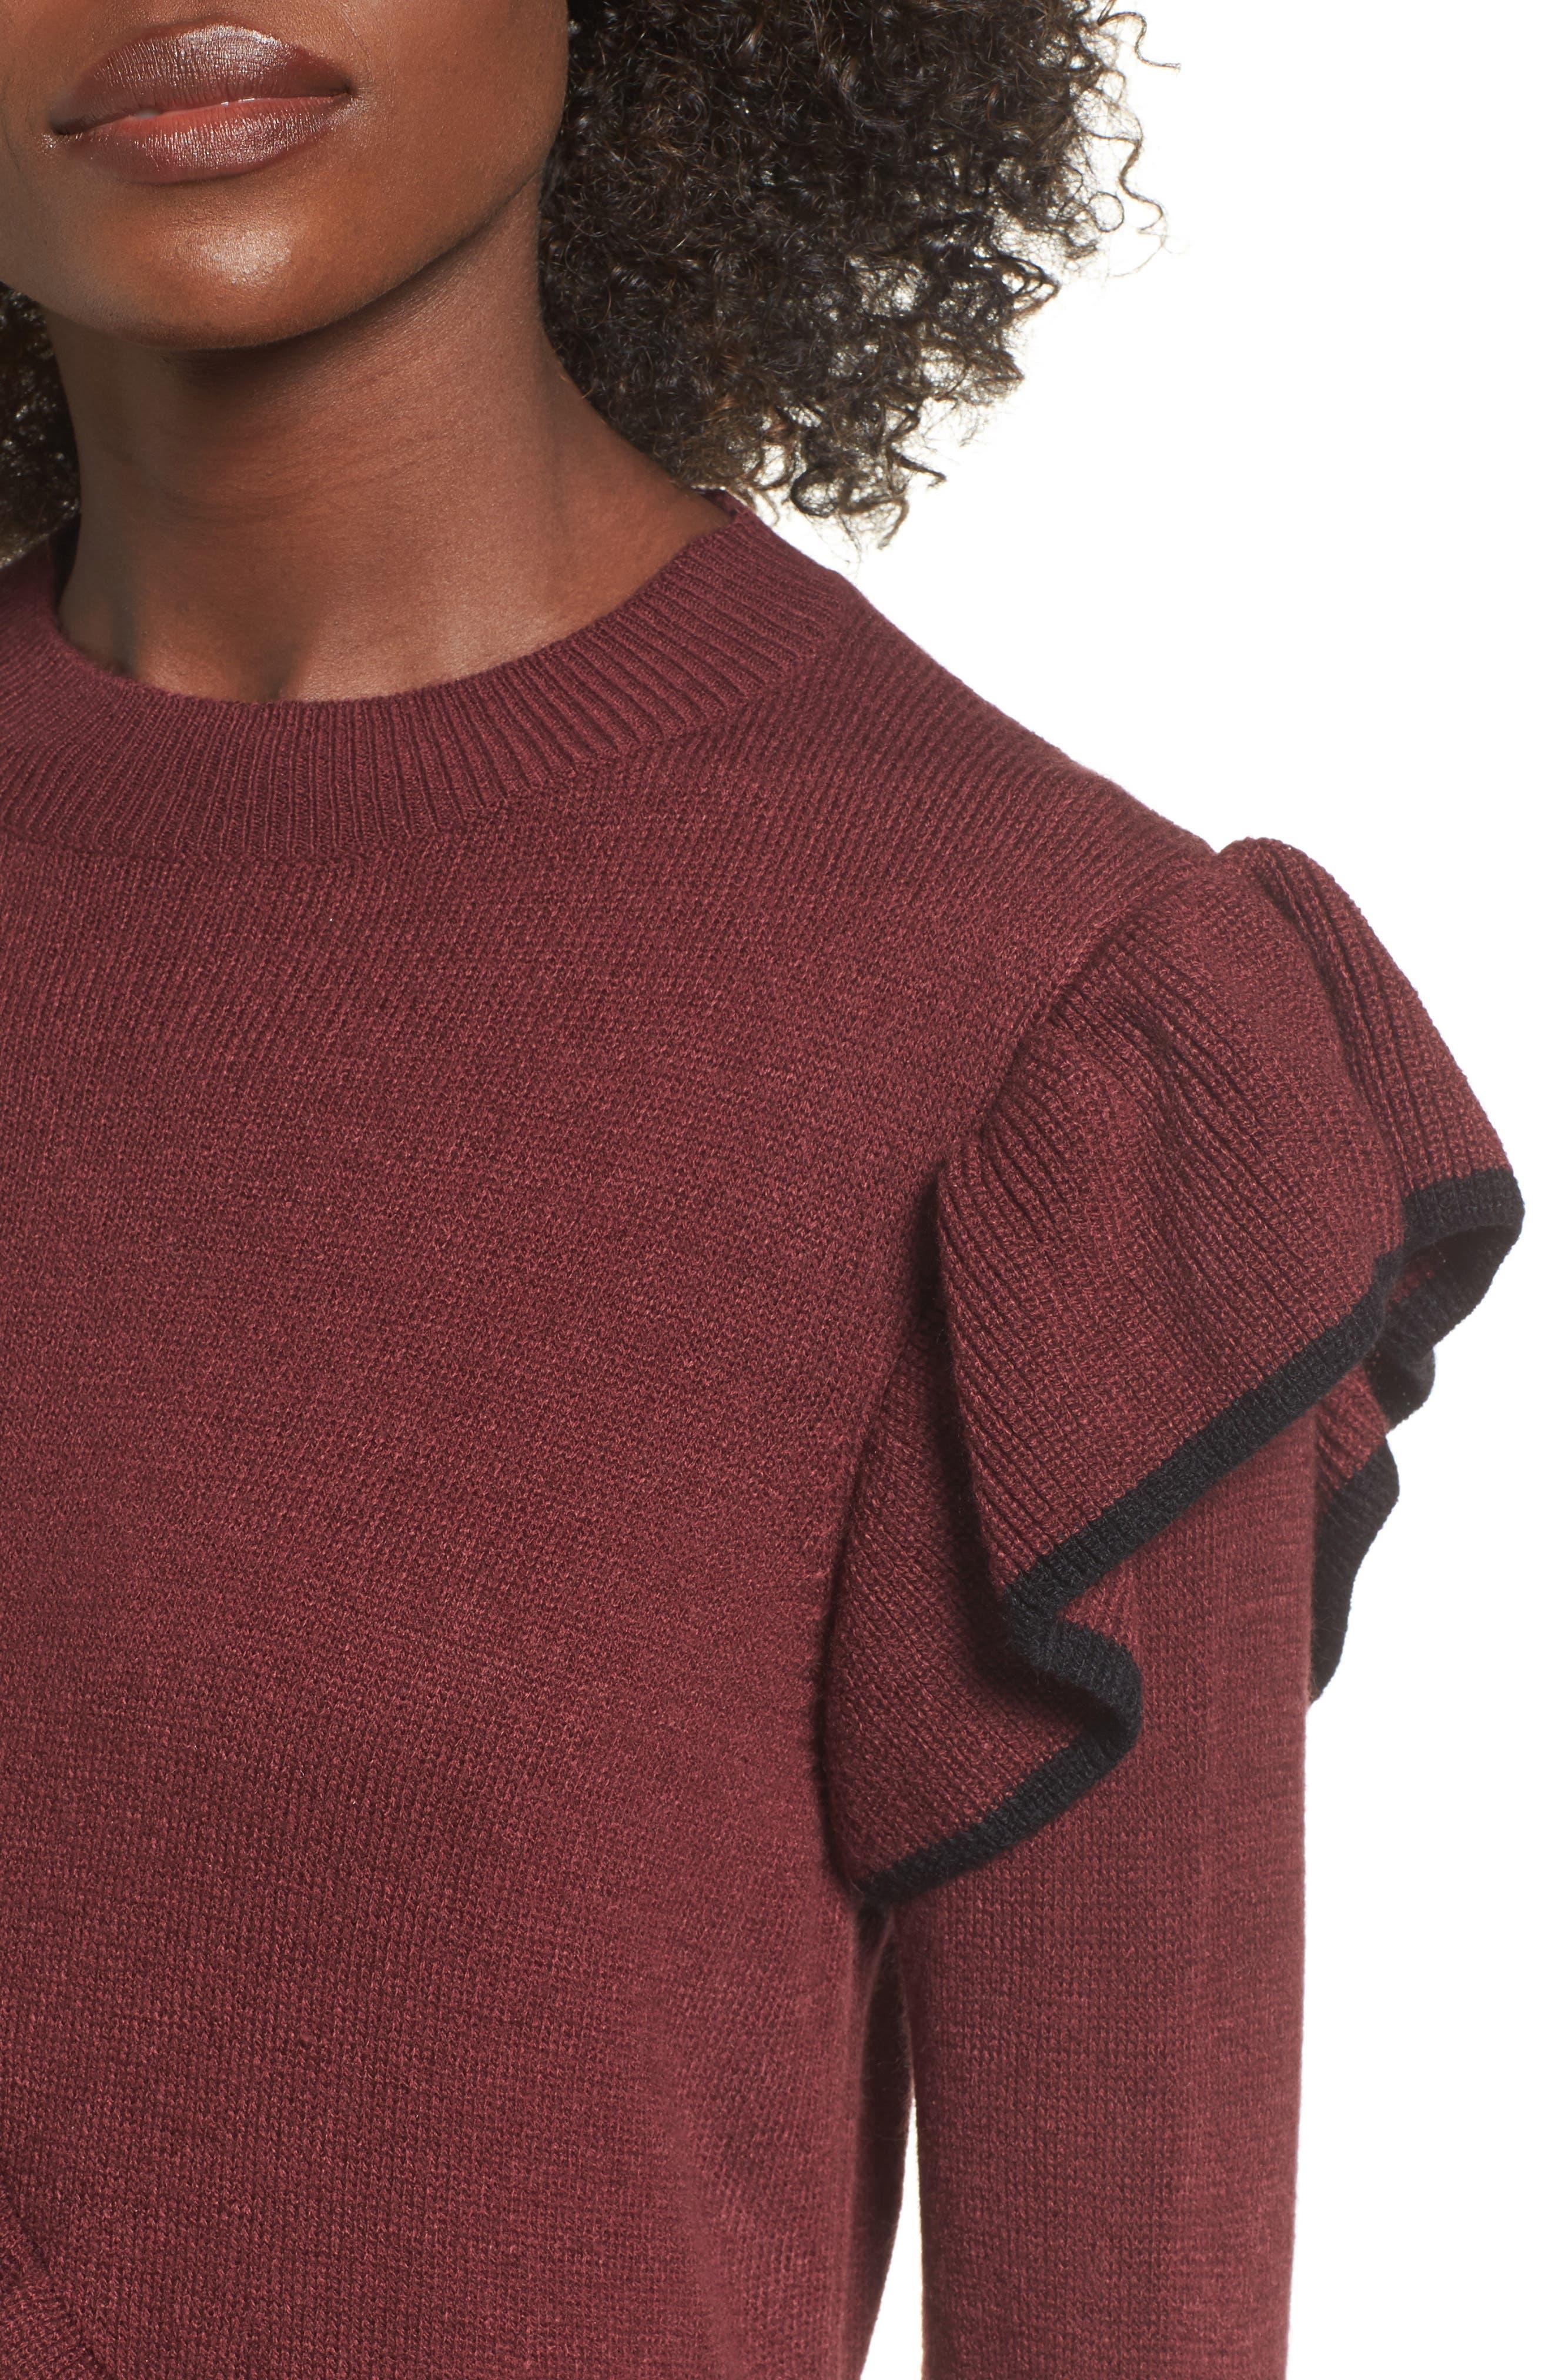 Ruffle Knit Sweater Dress,                             Alternate thumbnail 4, color,                             Burgundy Royale